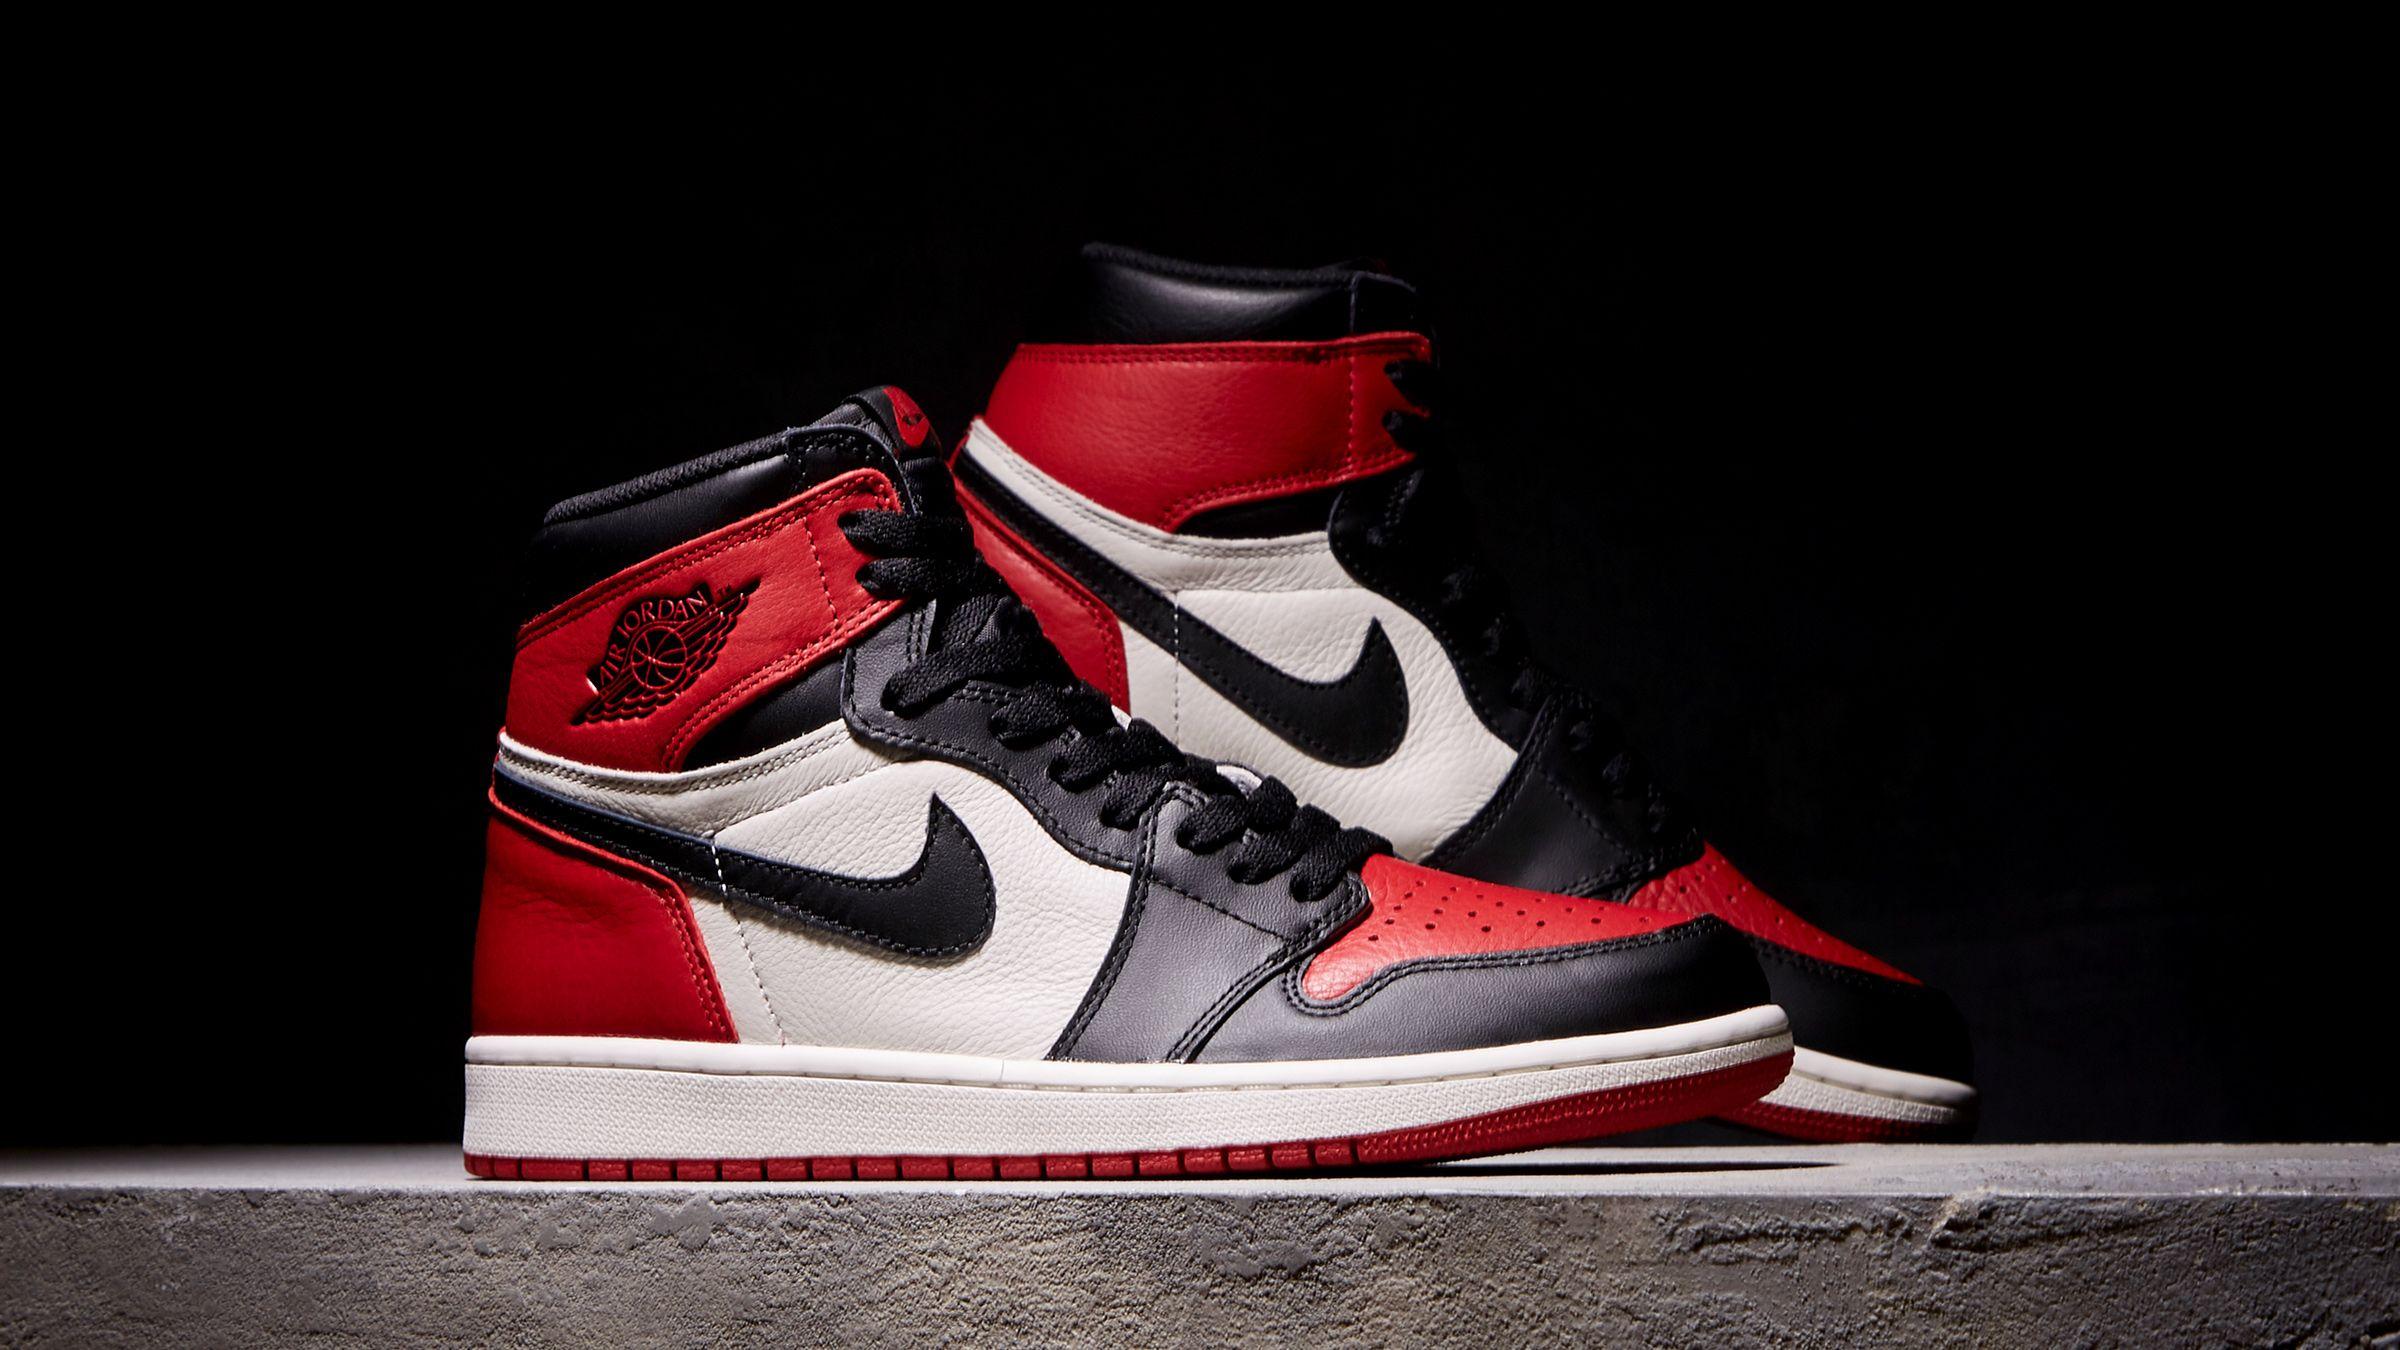 Nike Air Jordan 1 Retro High Og Gym Red Black Summit White